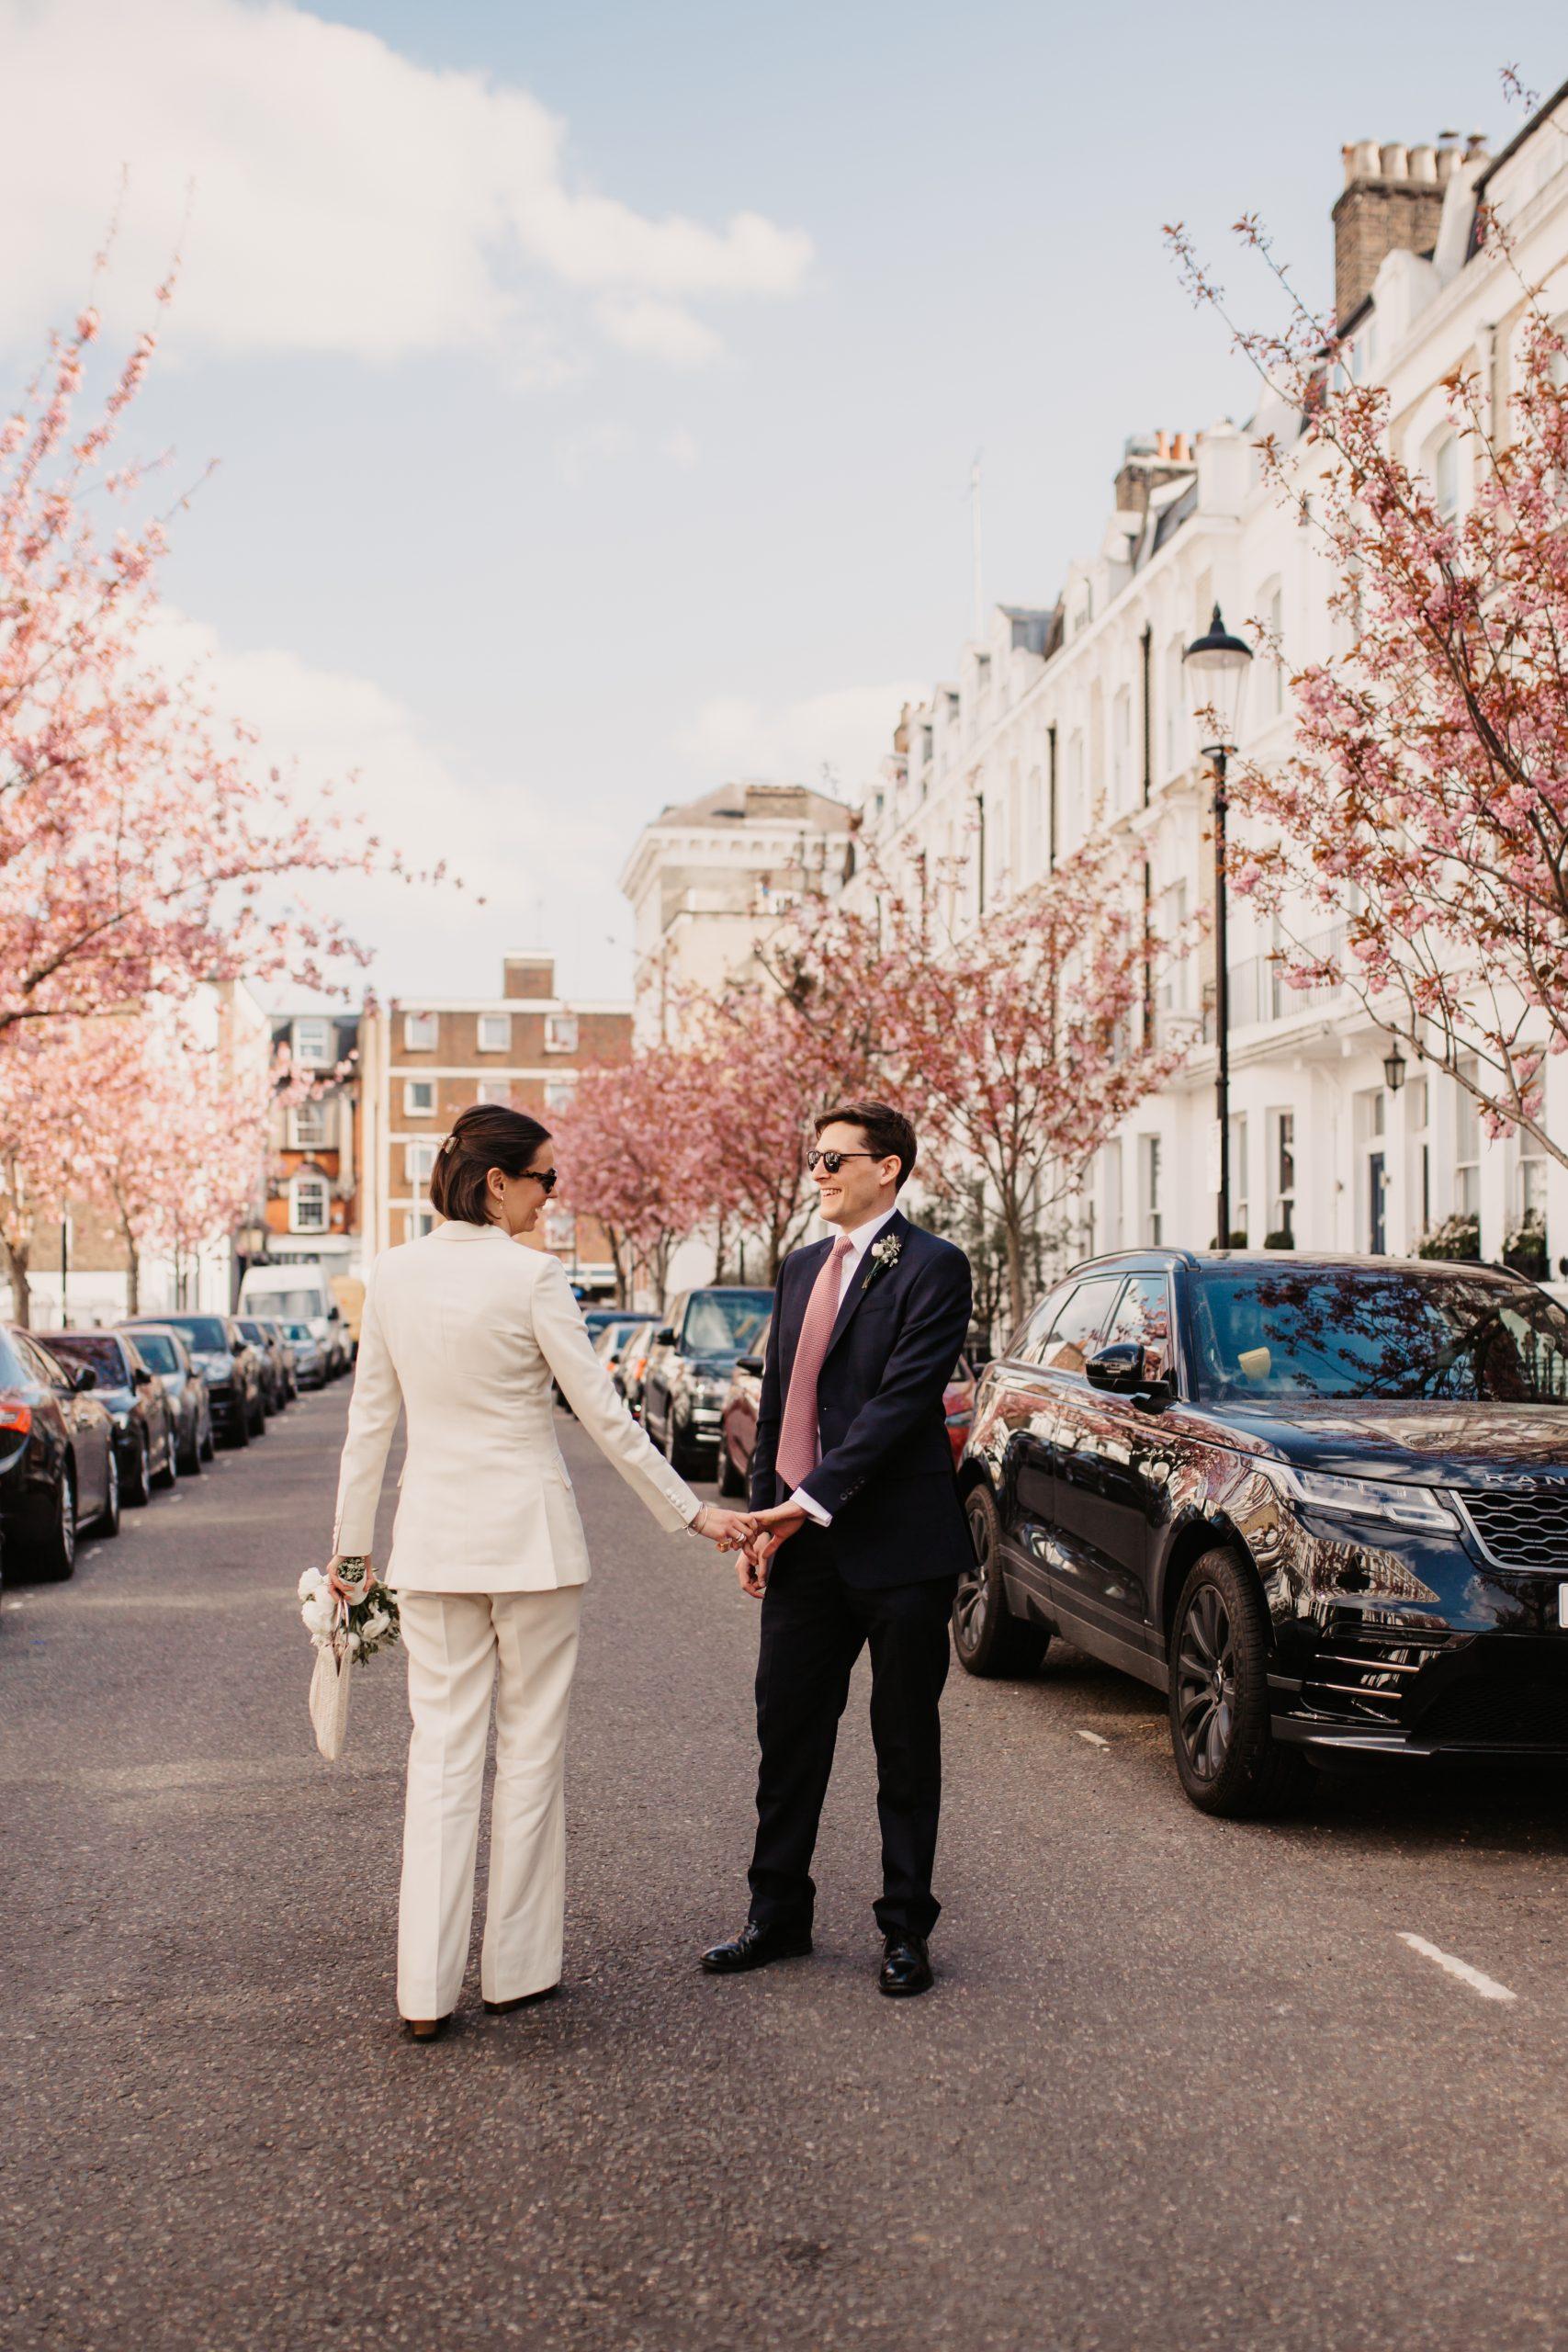 Spring Blossom Micro Wedding | Chelsea, London